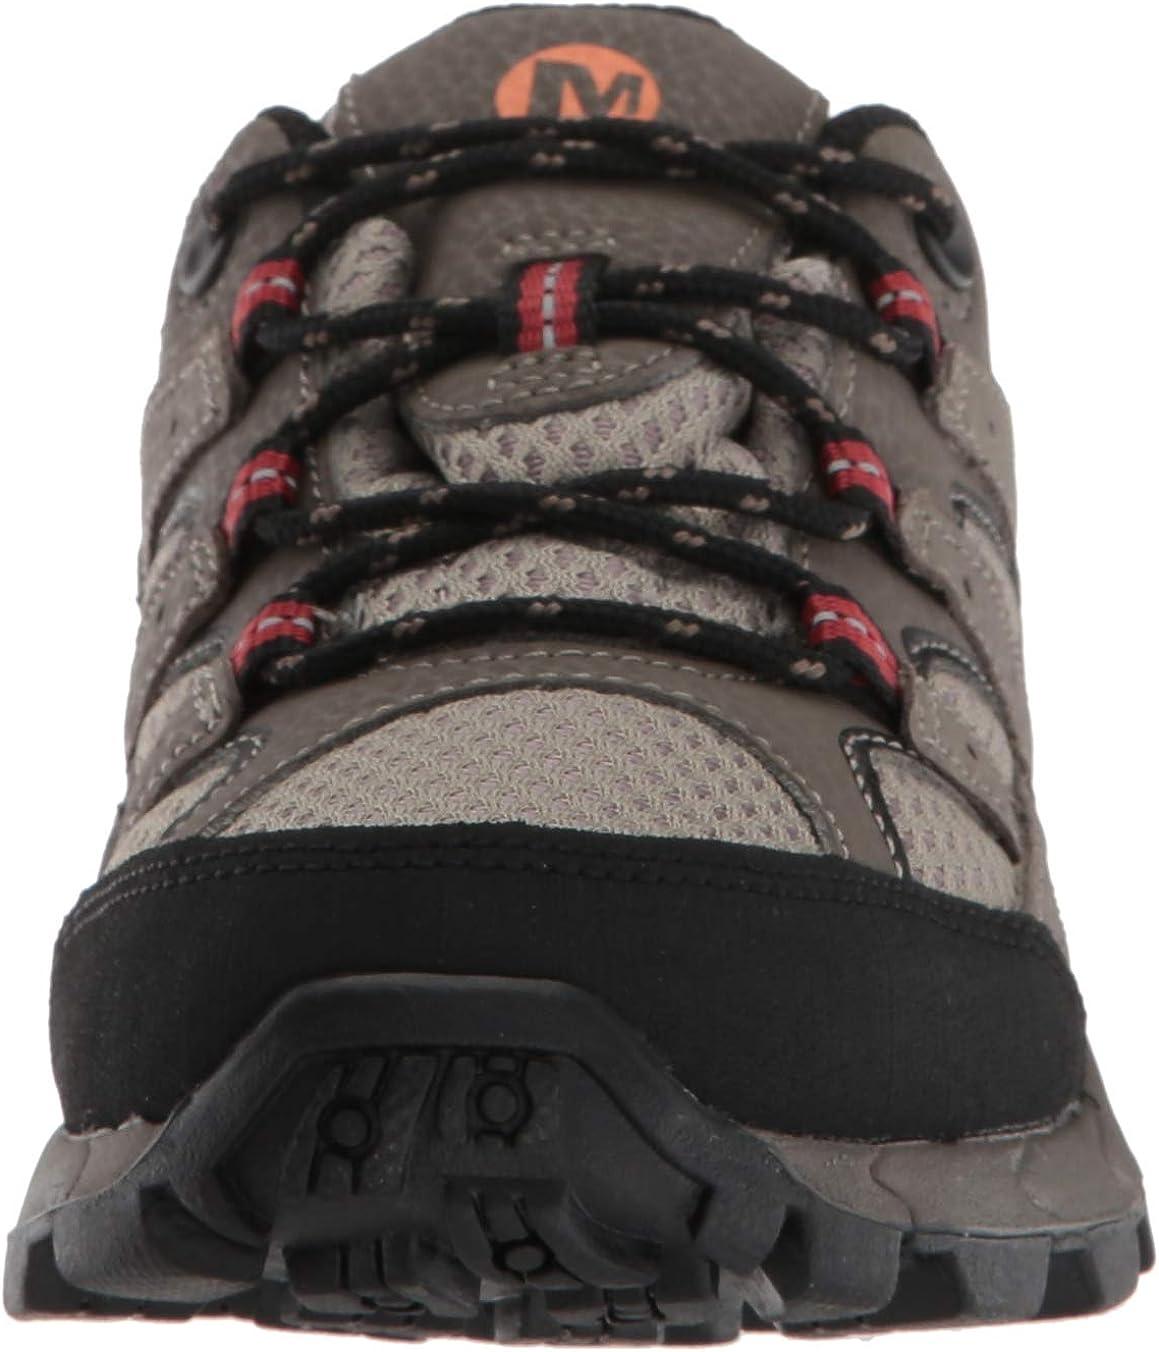 Merrell Kids M-Moab 2 Low Lace Hiking Shoe